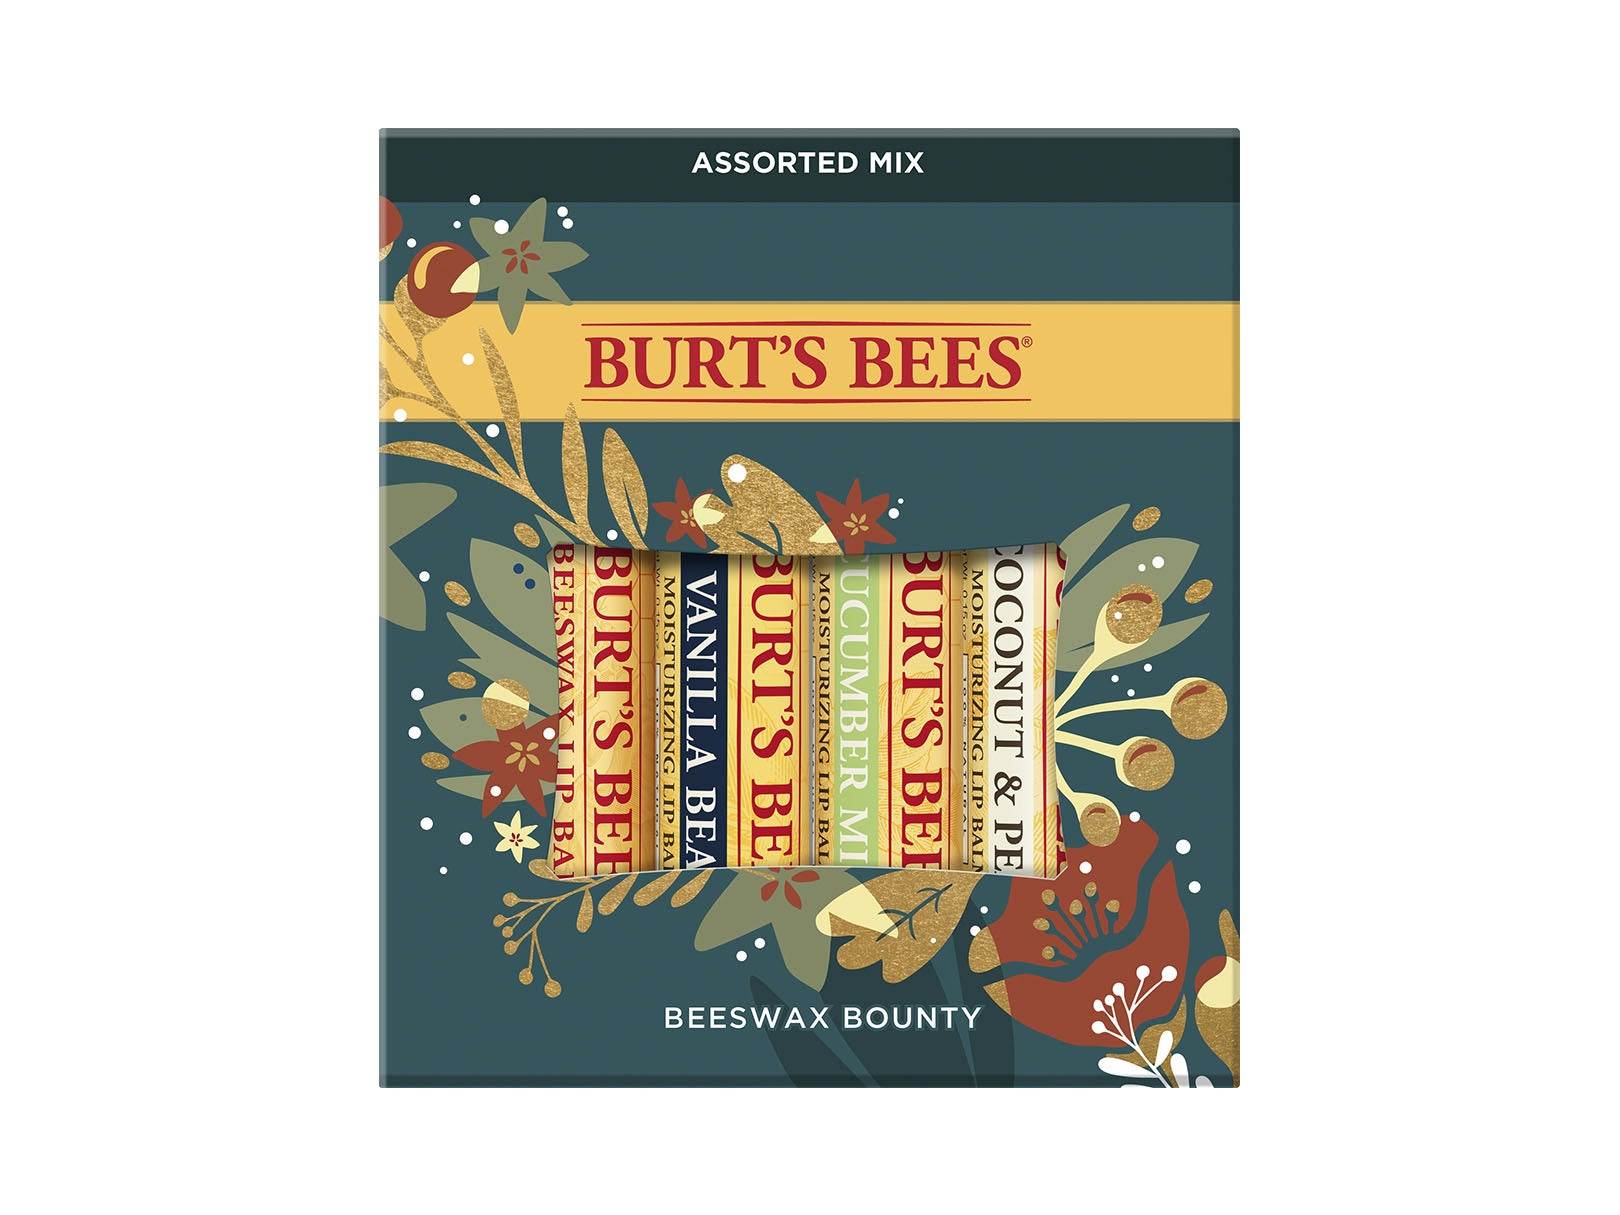 Burt's Bees Beeswax Bounty Assorted Gift